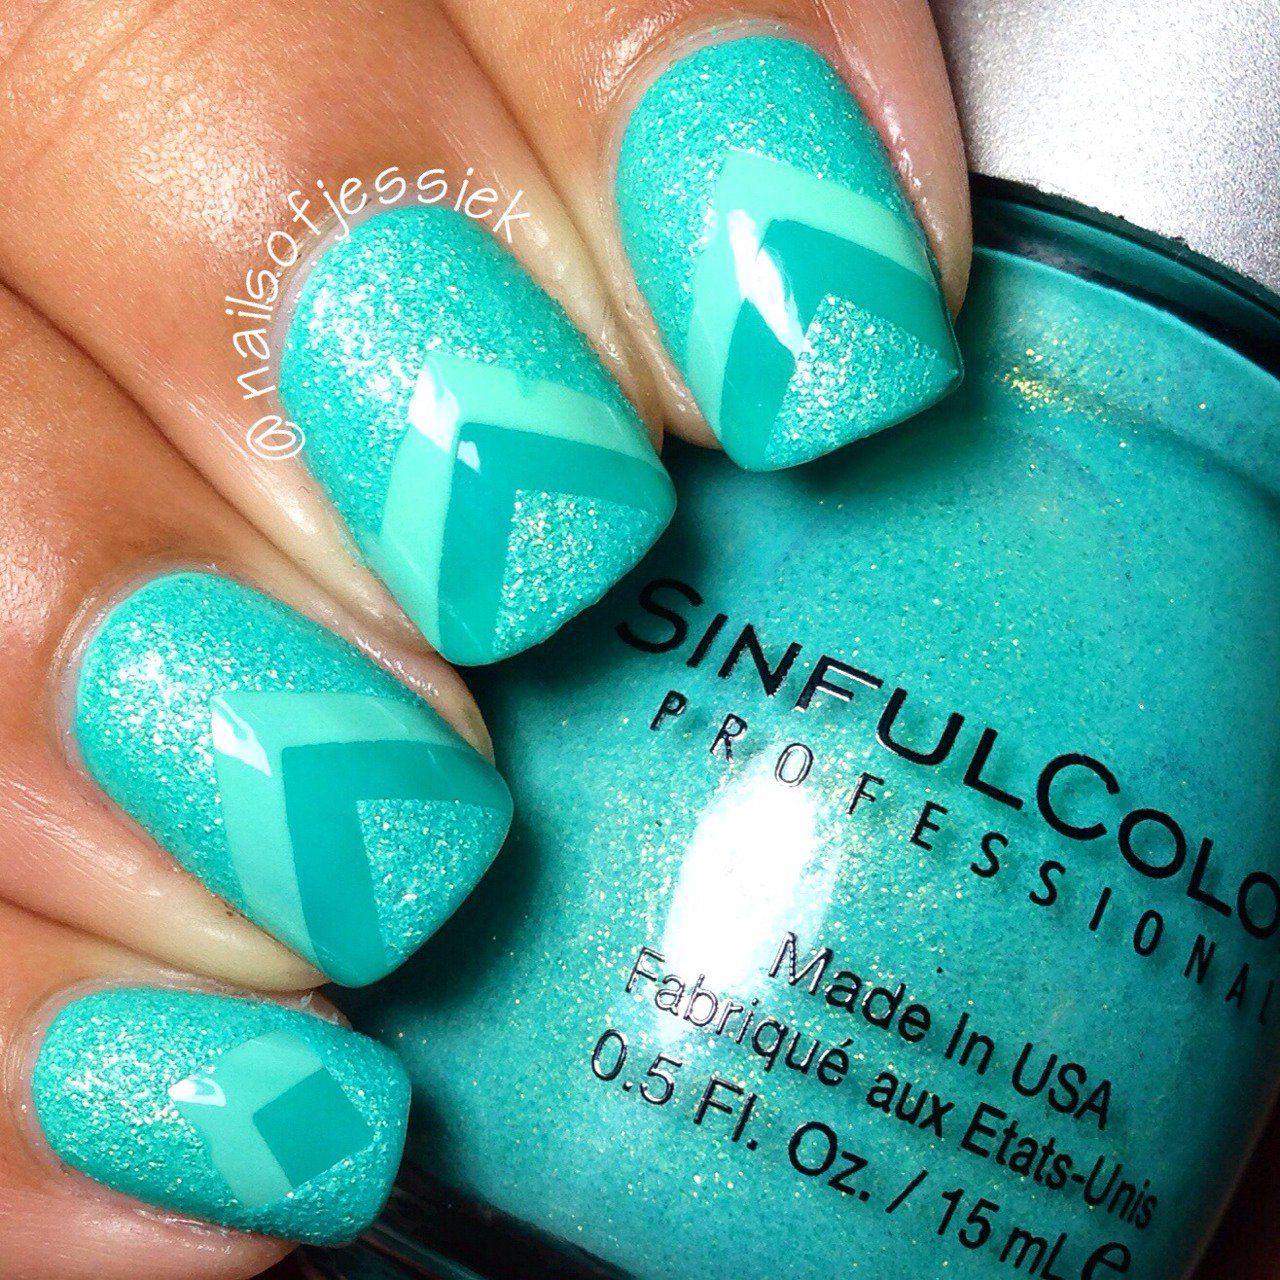 Nail Art Ideas glamorous nail art designs : 26 Glamorous Nail Art Designs   Nail Art   Pinterest   Makeup